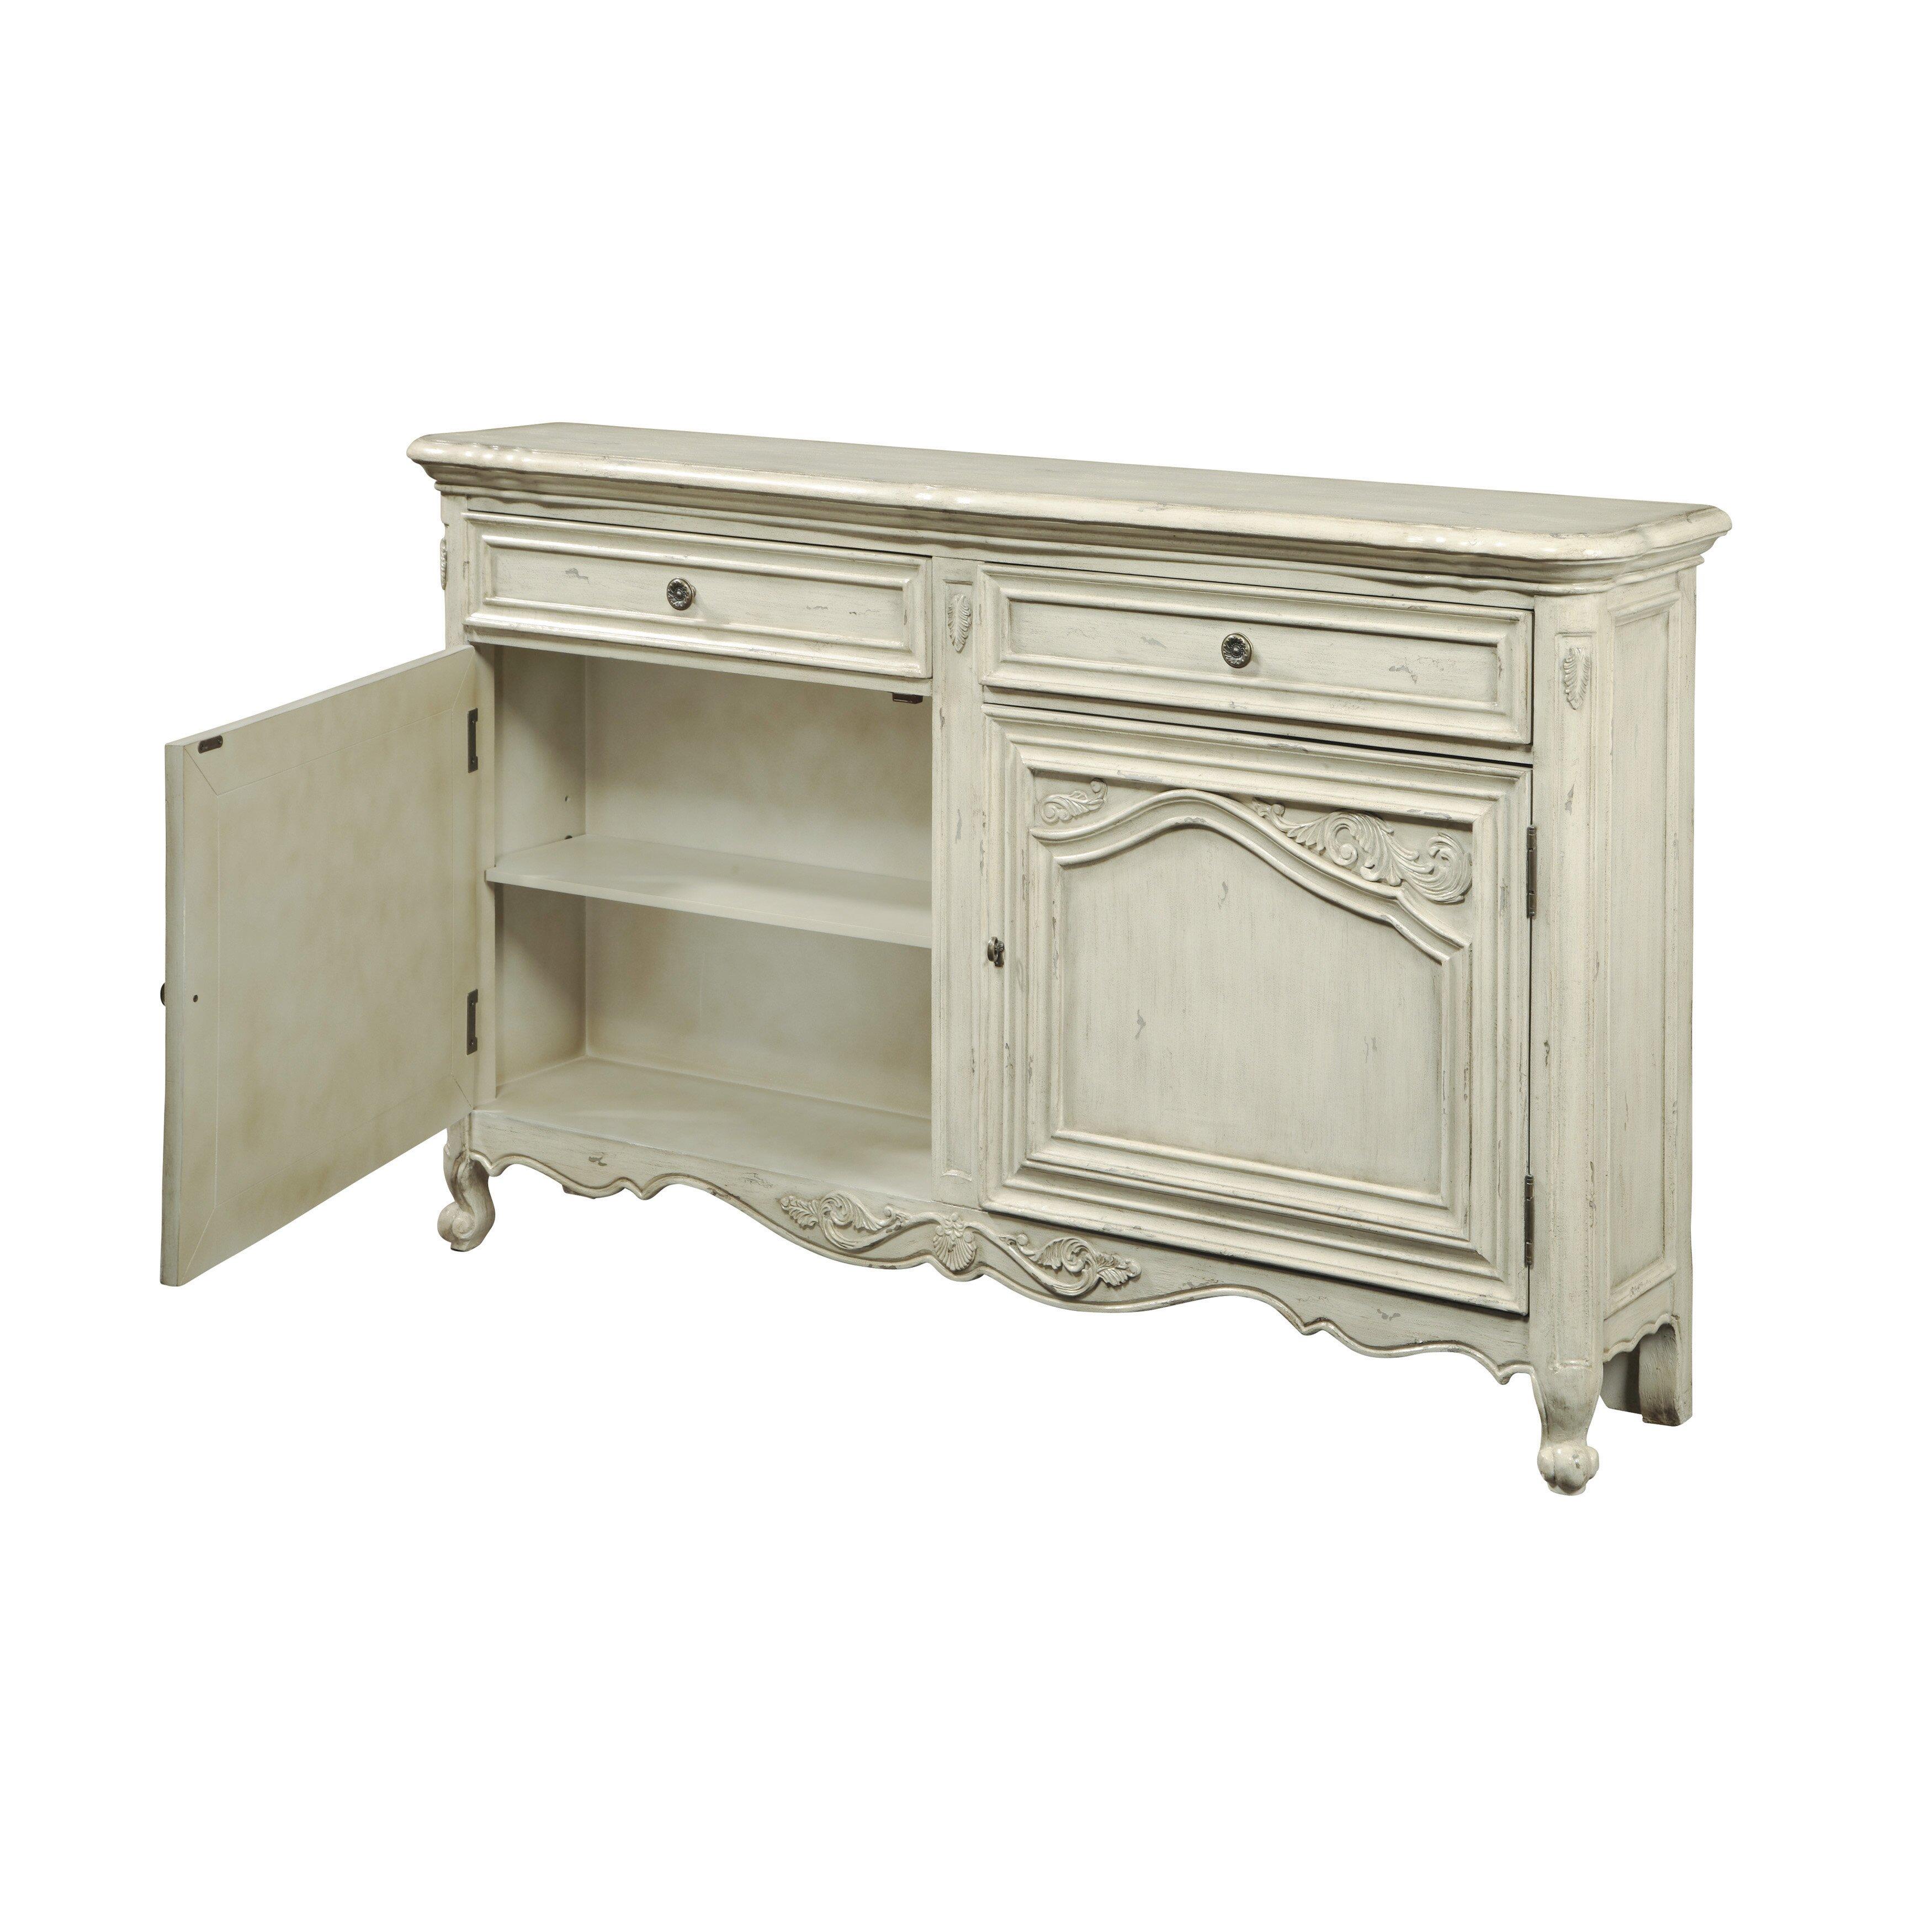 Pulaski console cabinet reviews wayfair for Pulaski furniture